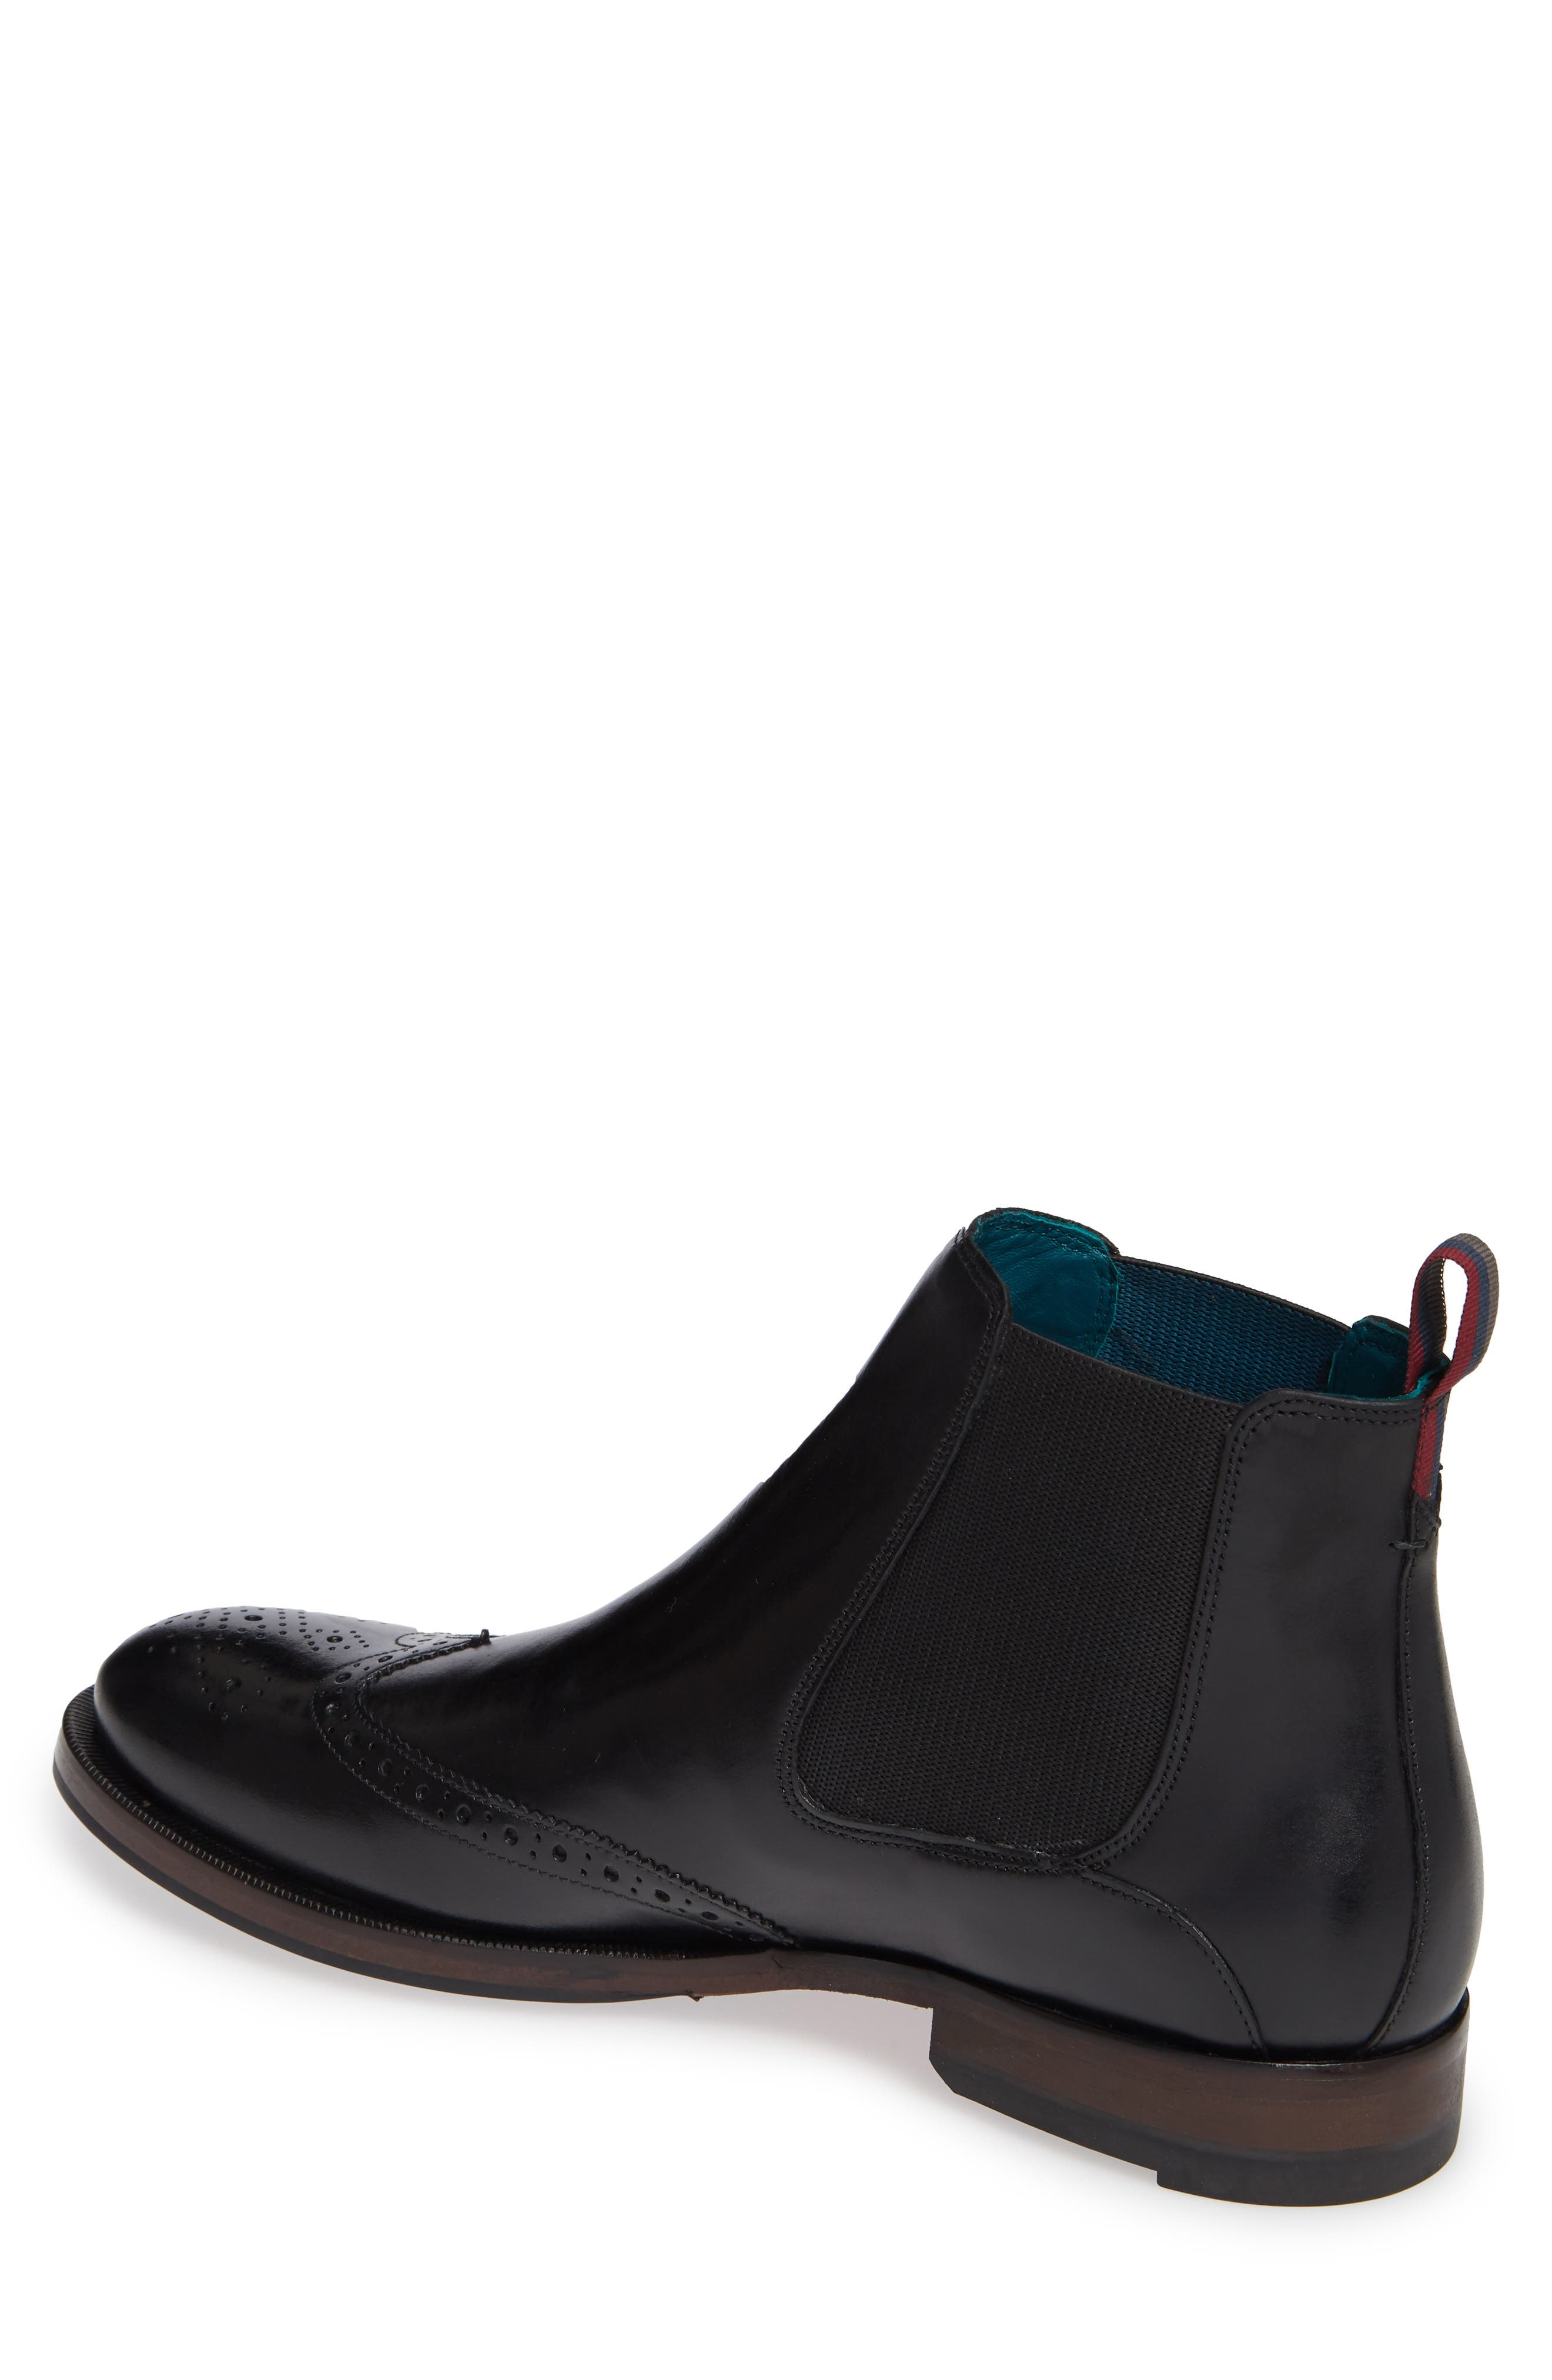 Camheri Wingtip Chelsea Boot,                             Alternate thumbnail 2, color,                             BLACK LEATHER